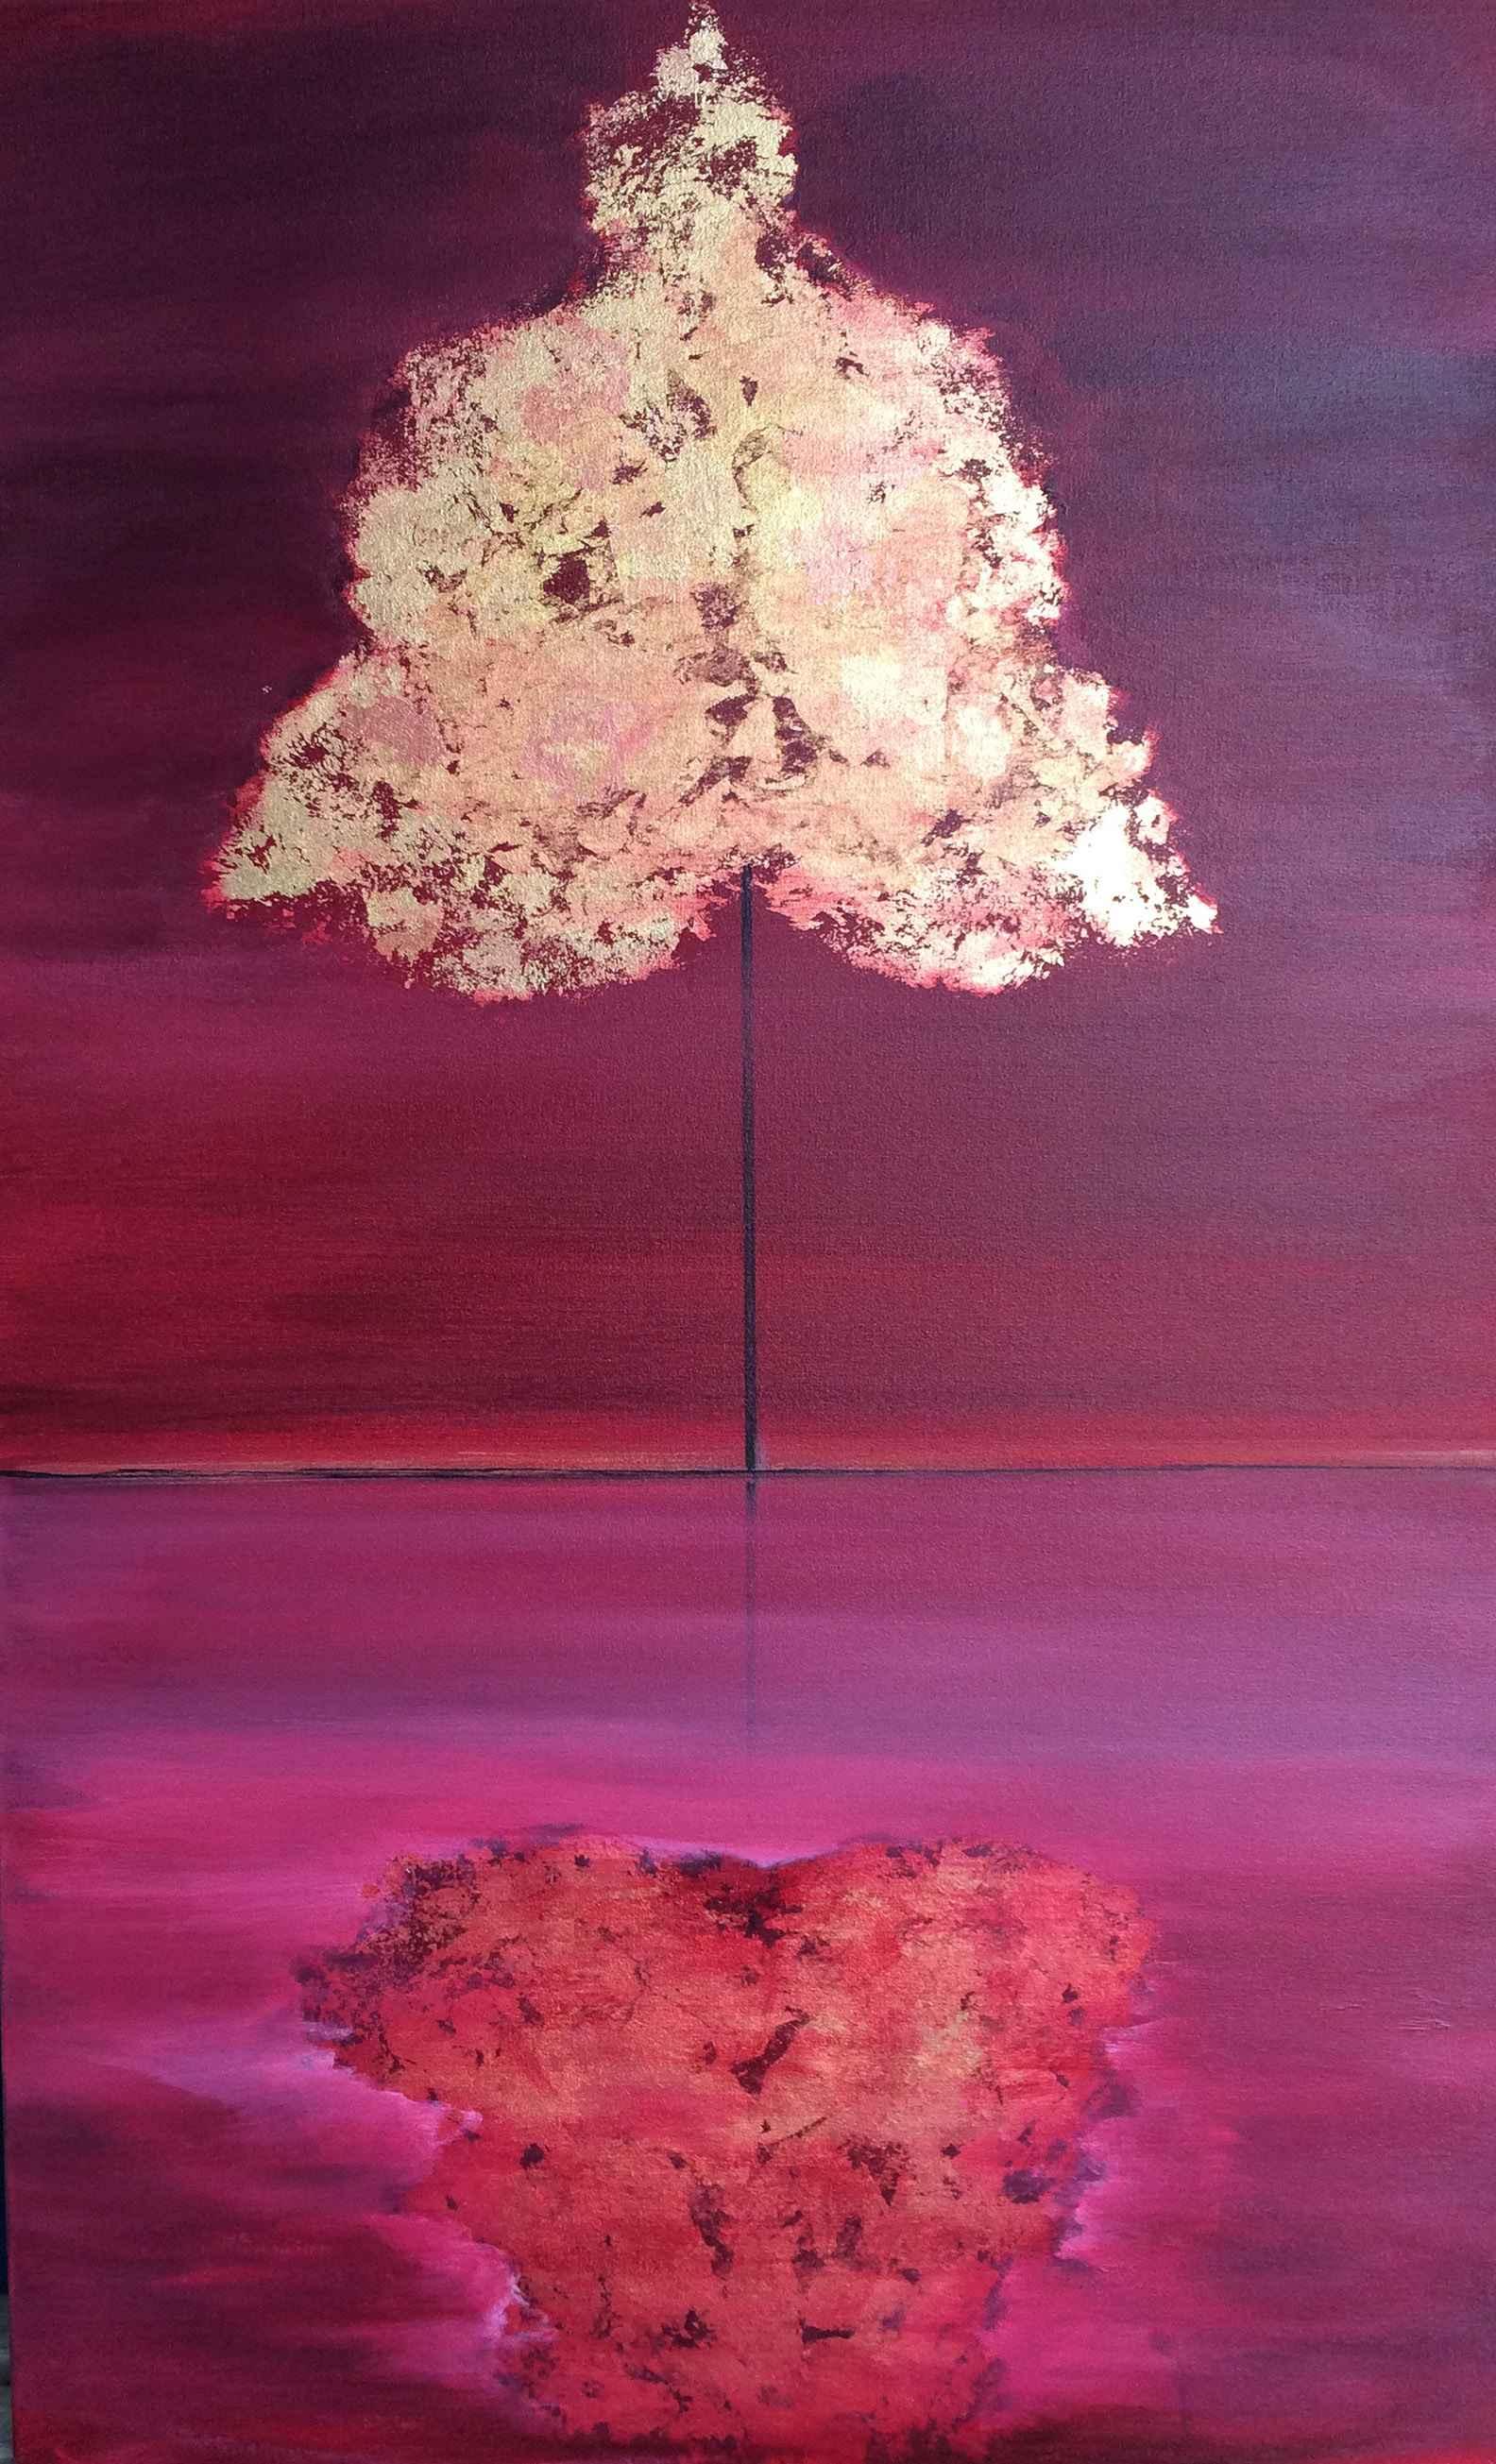 The Wishing Tree #3 by  Steve Lyons - Masterpiece Online